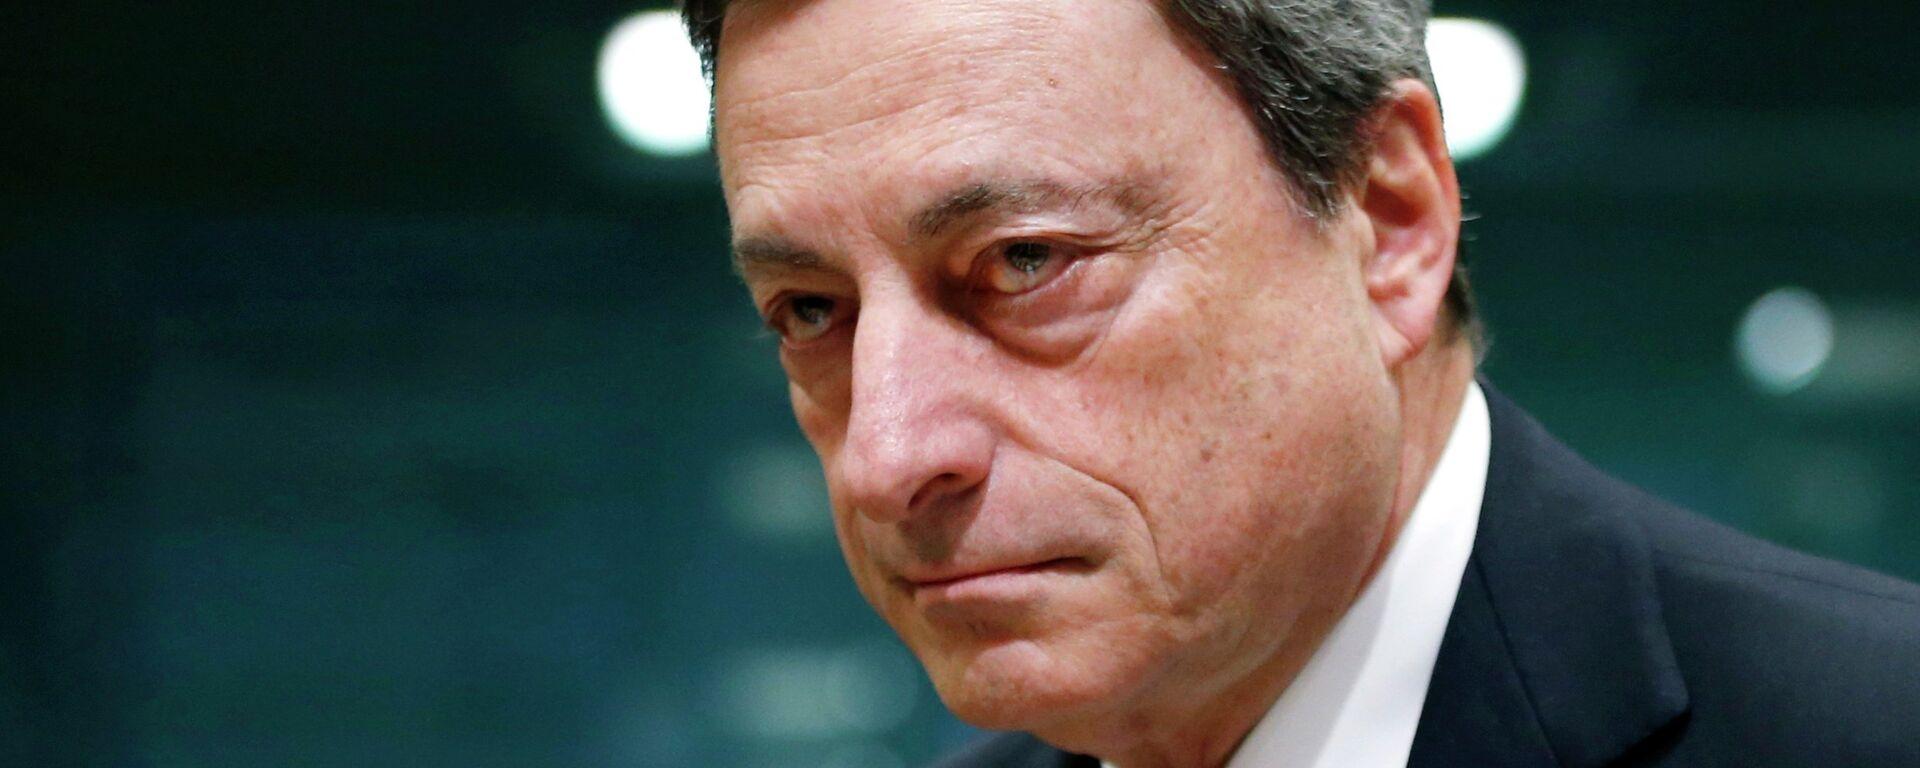 Mario Draghi, primer ministro de Italia - Sputnik Mundo, 1920, 12.06.2021